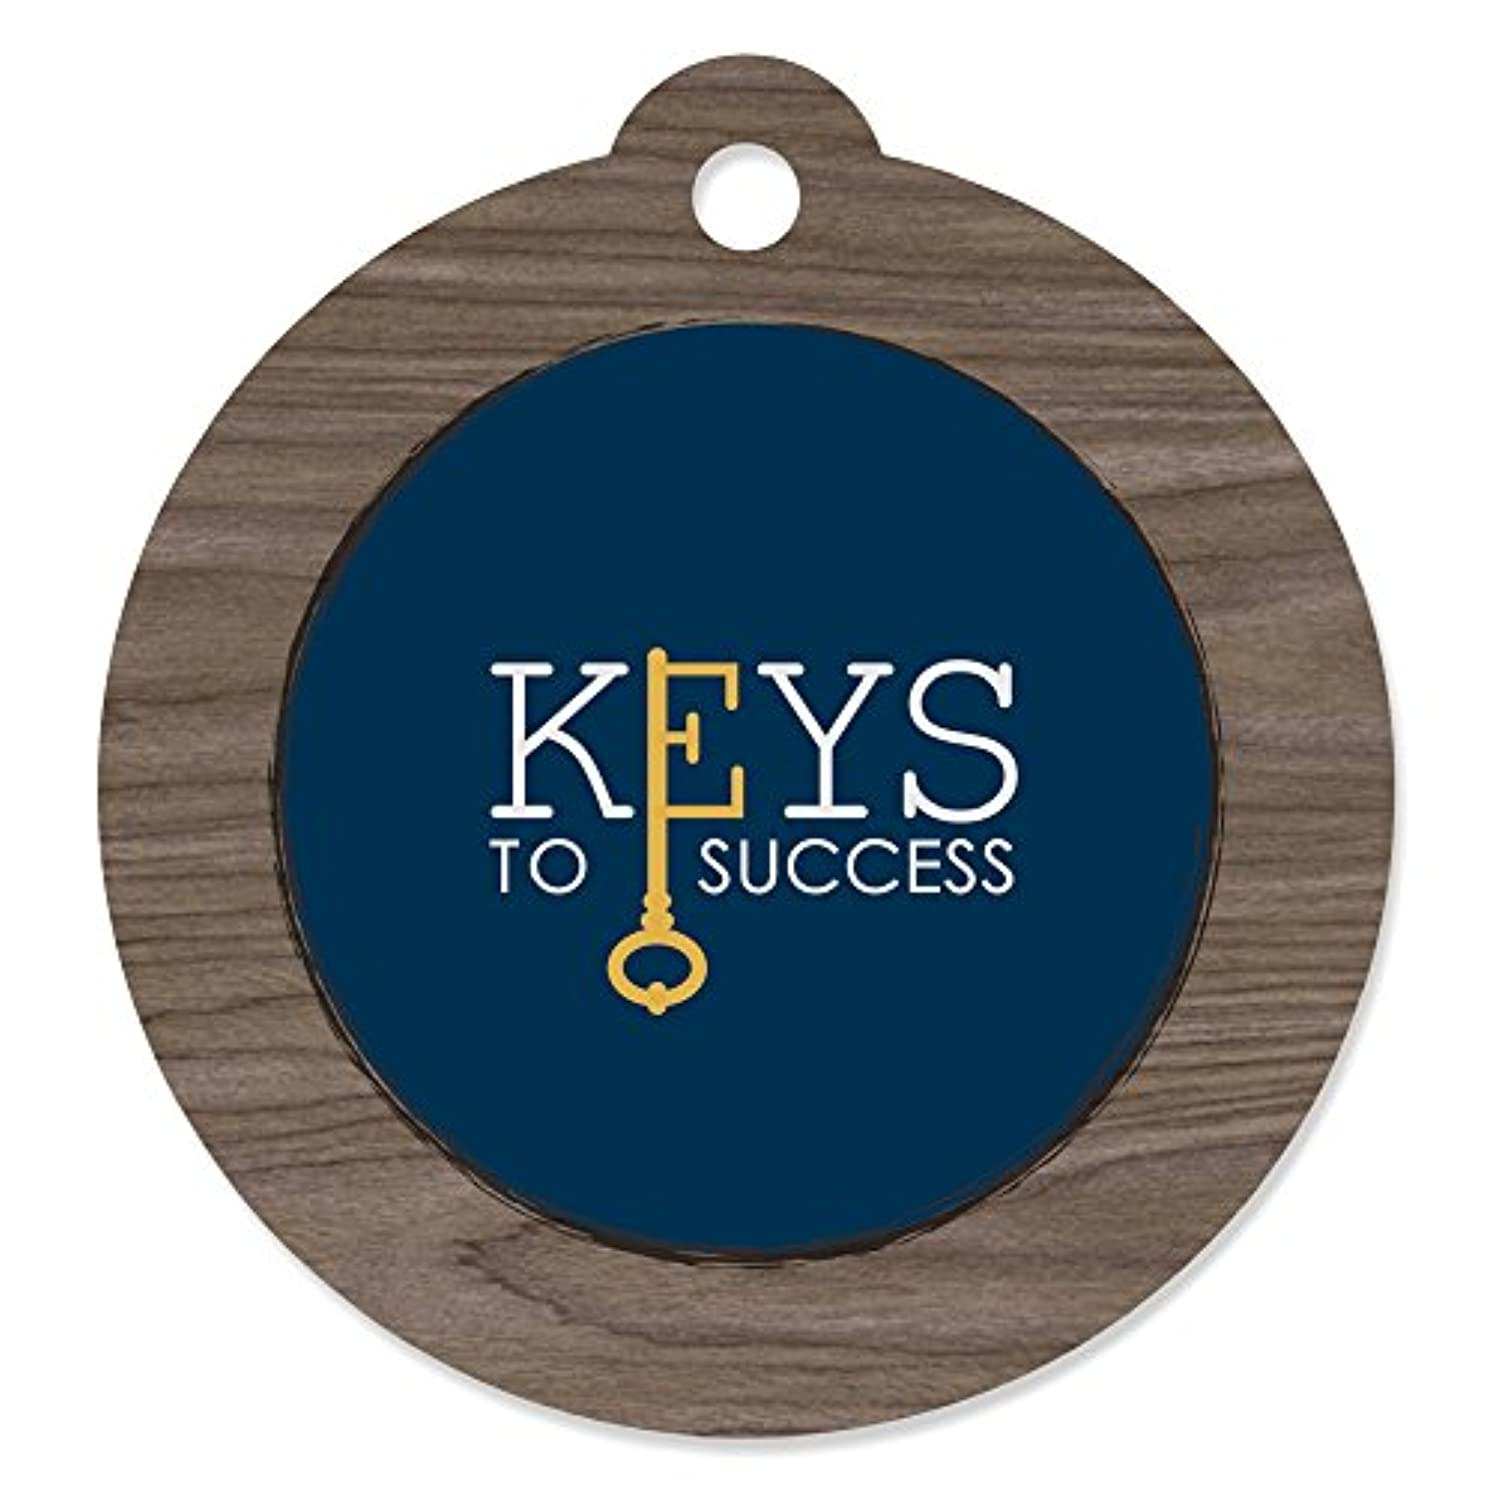 Grad Keys to Success - Graduation Party Favor Gift Tags (Set of 20)